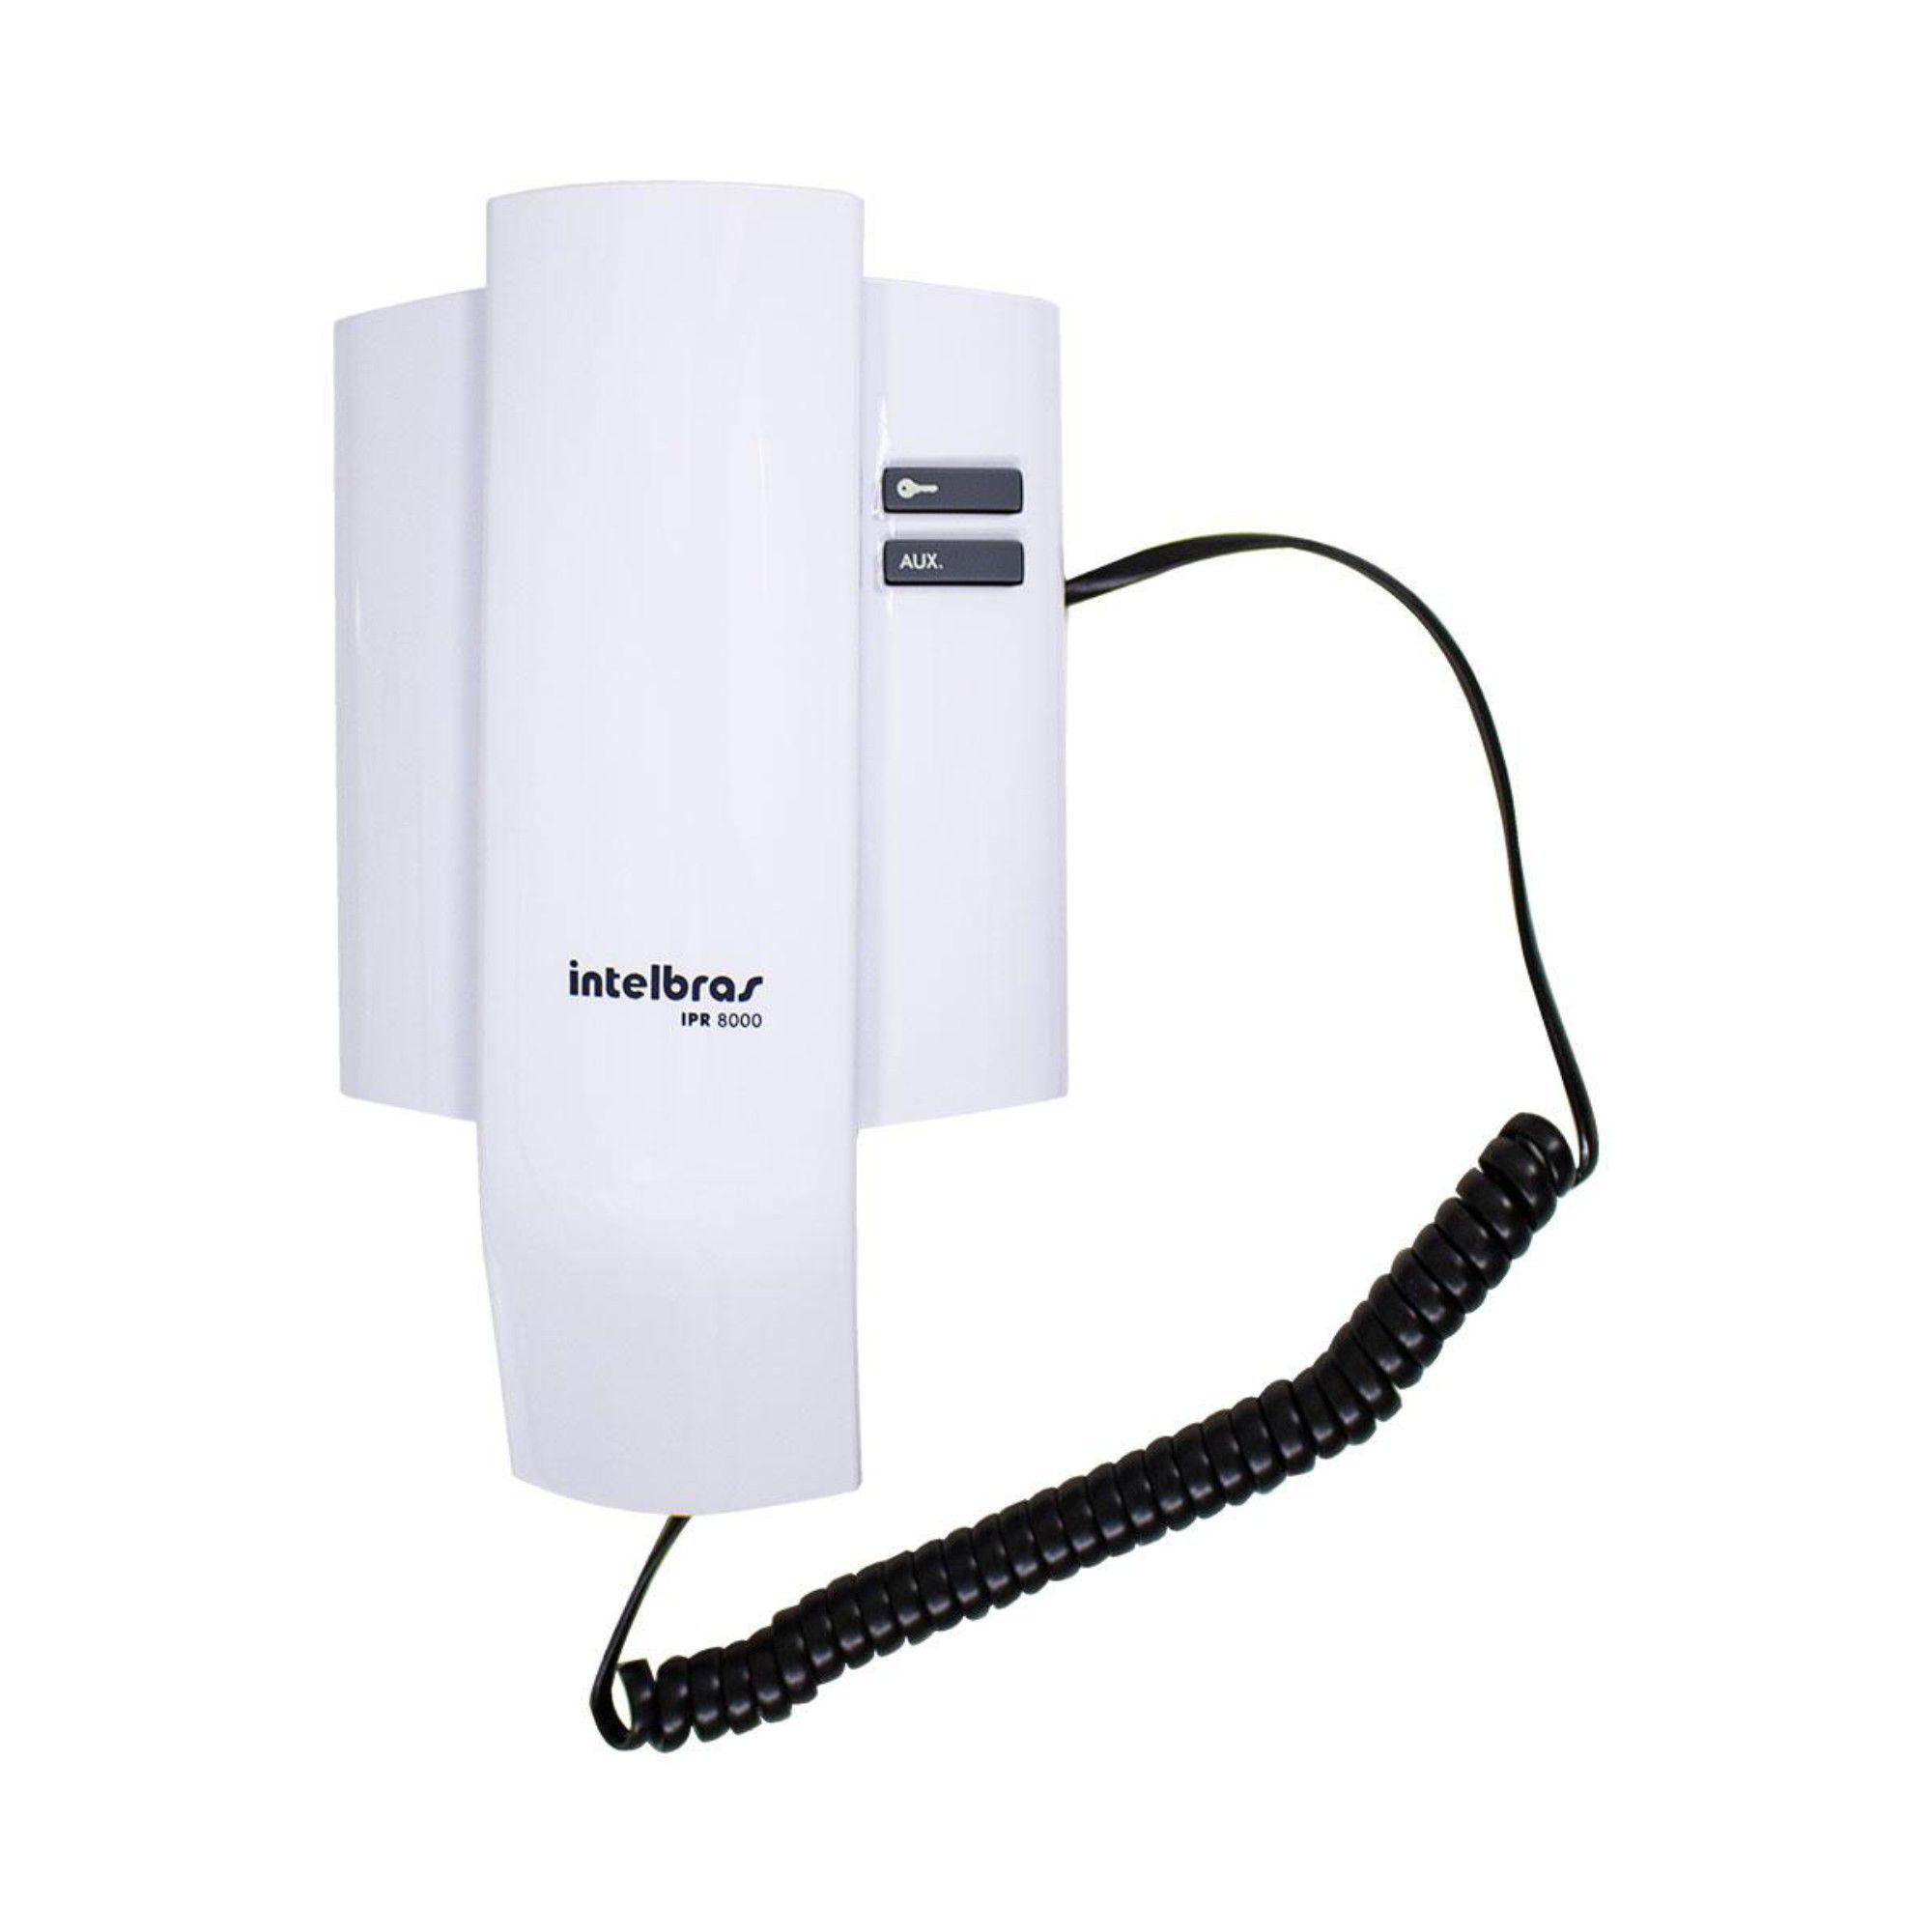 Extensão Intelbras Ipr8000 In Porteiro Eletrônico Interfone